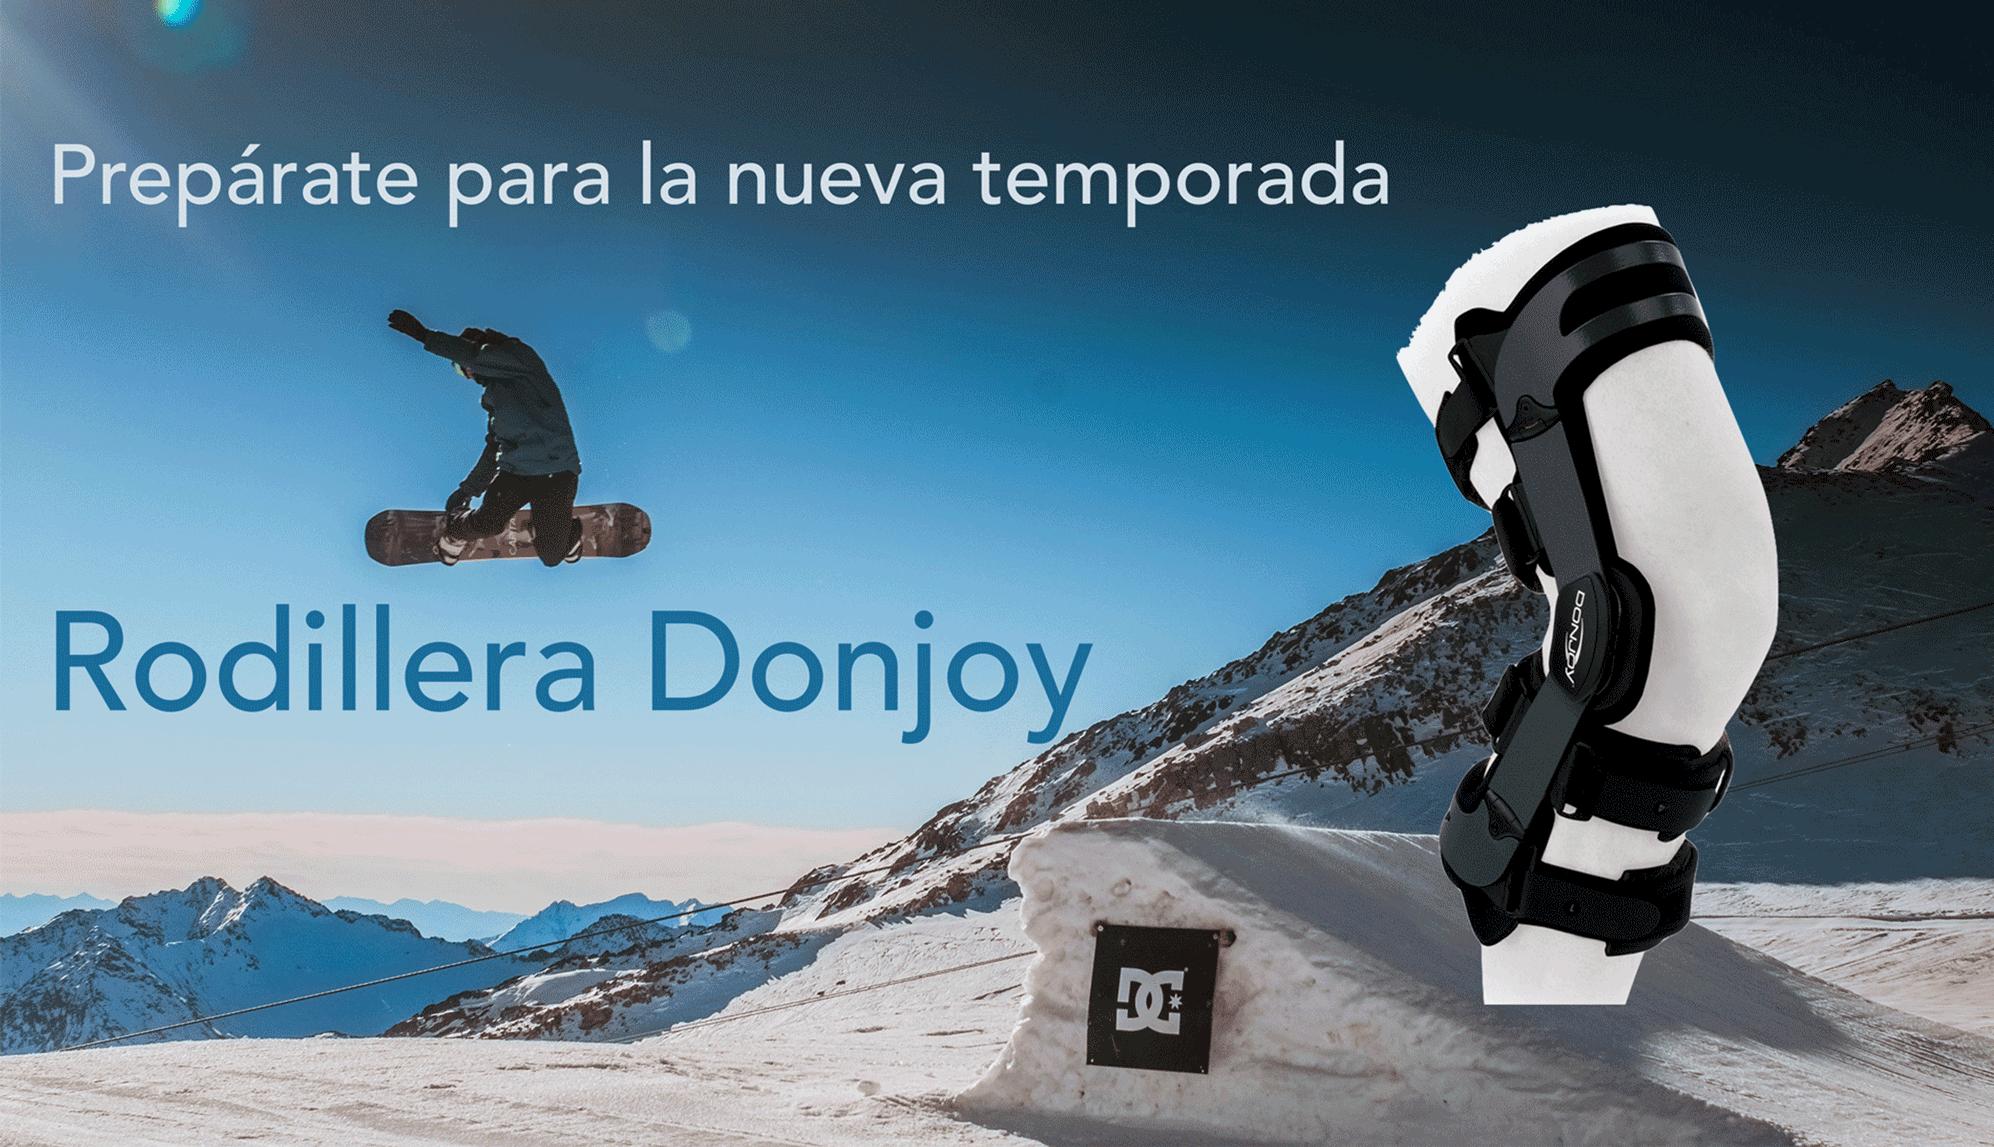 Rodillera Donjoy